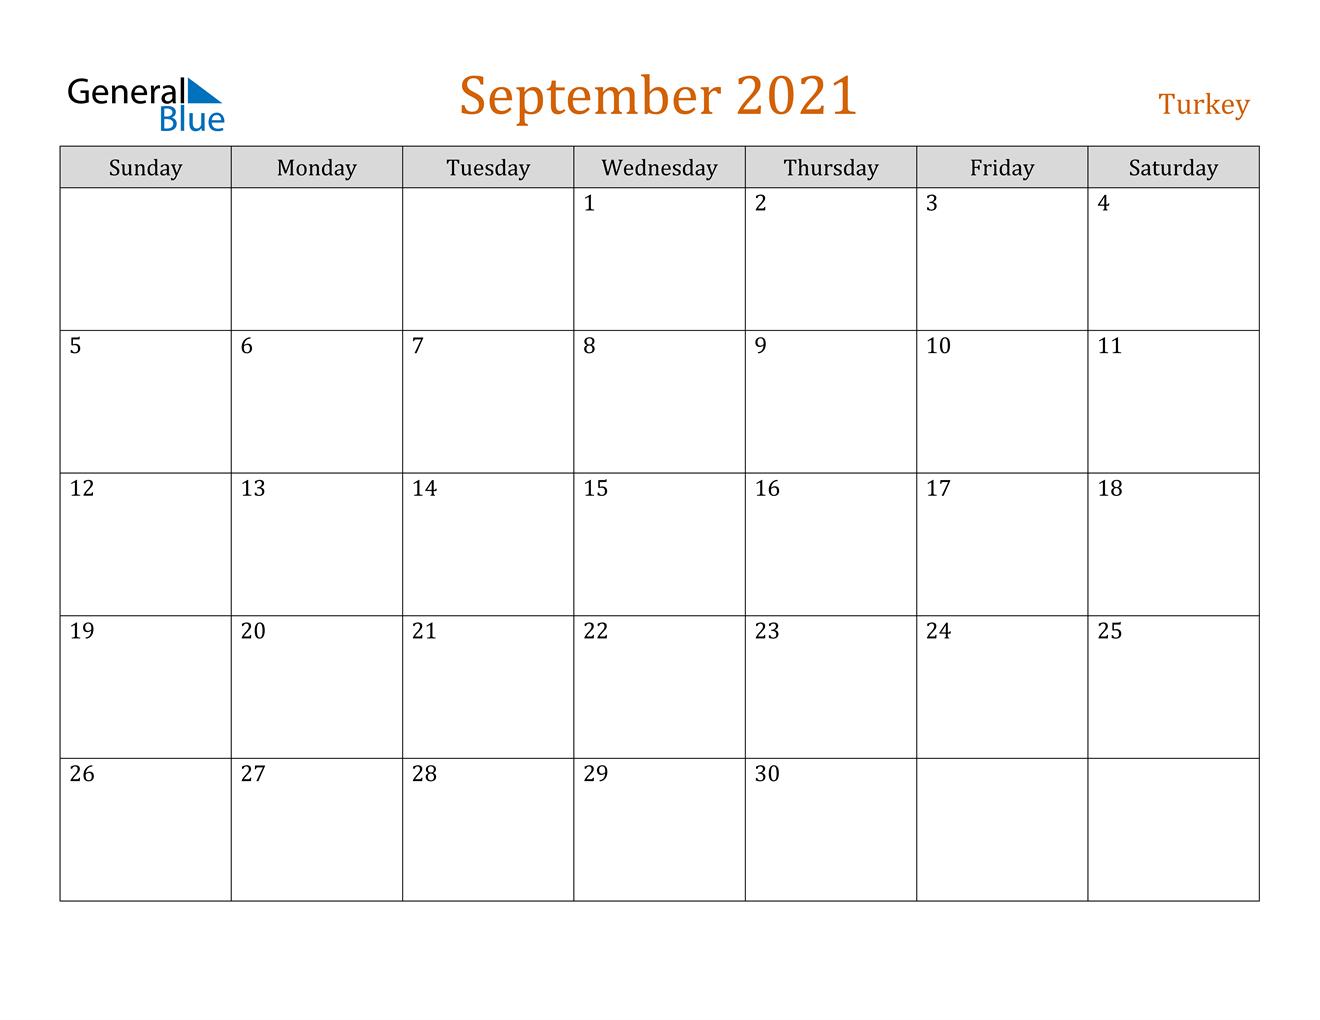 September 2021 Calendar - Turkey